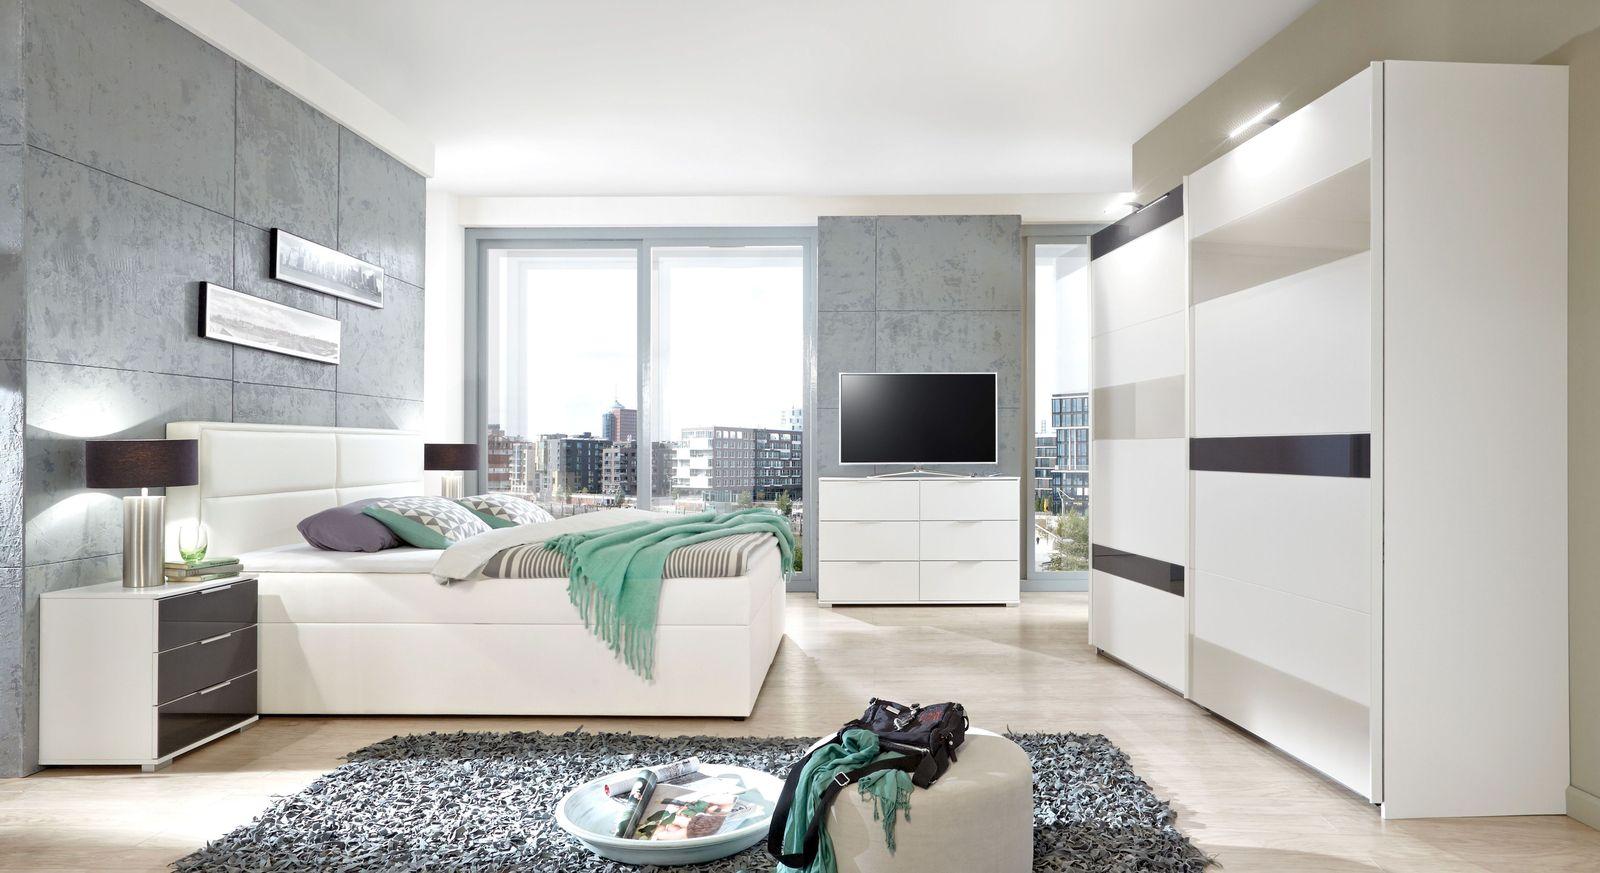 Komplett Schlafzimmer Sinopoli In Modernem Look